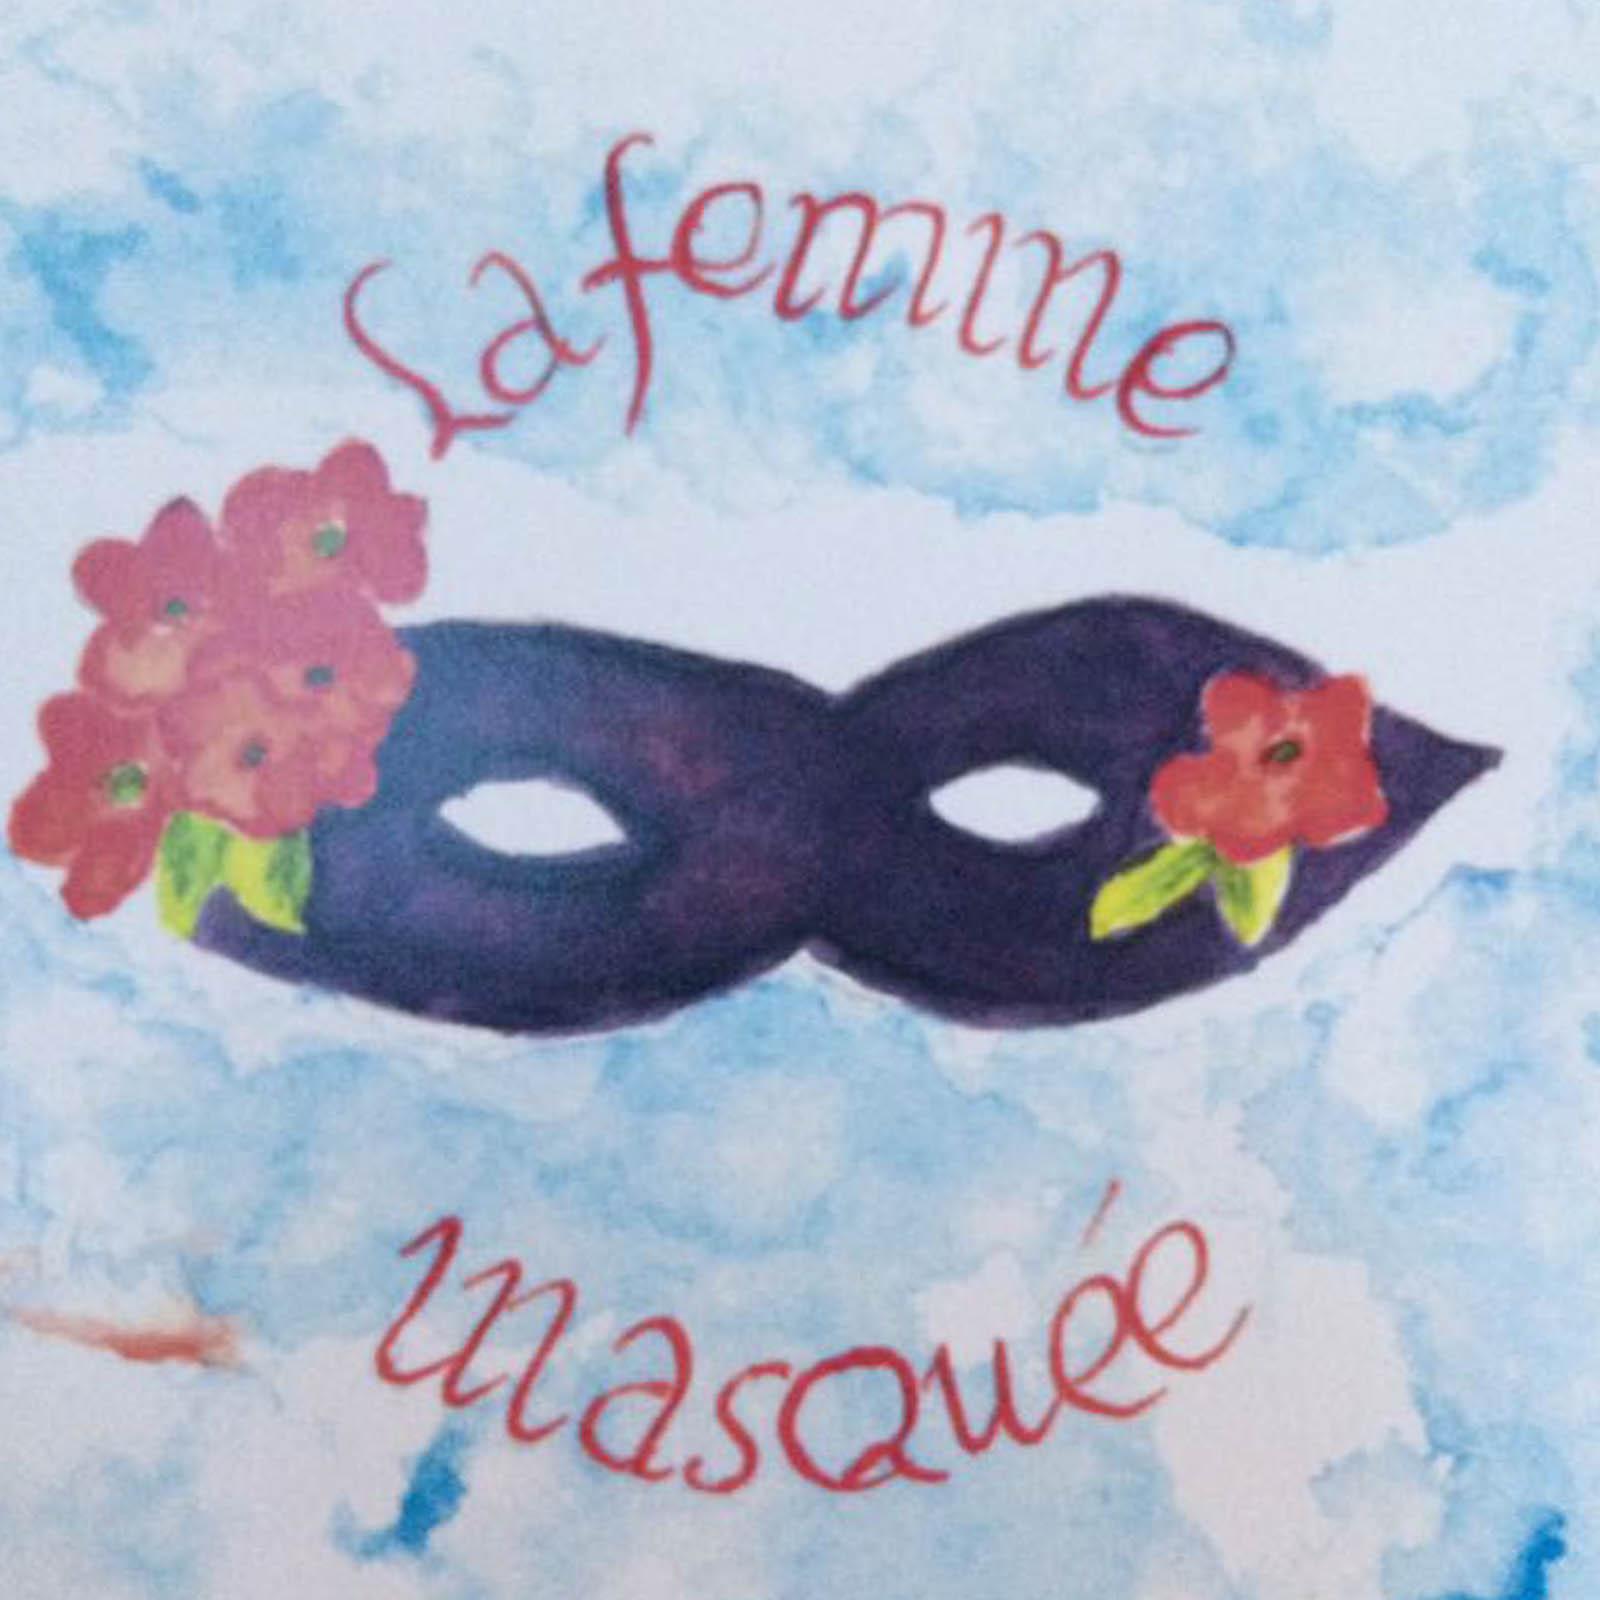 La Femme Masquée – Vendredi 16h30